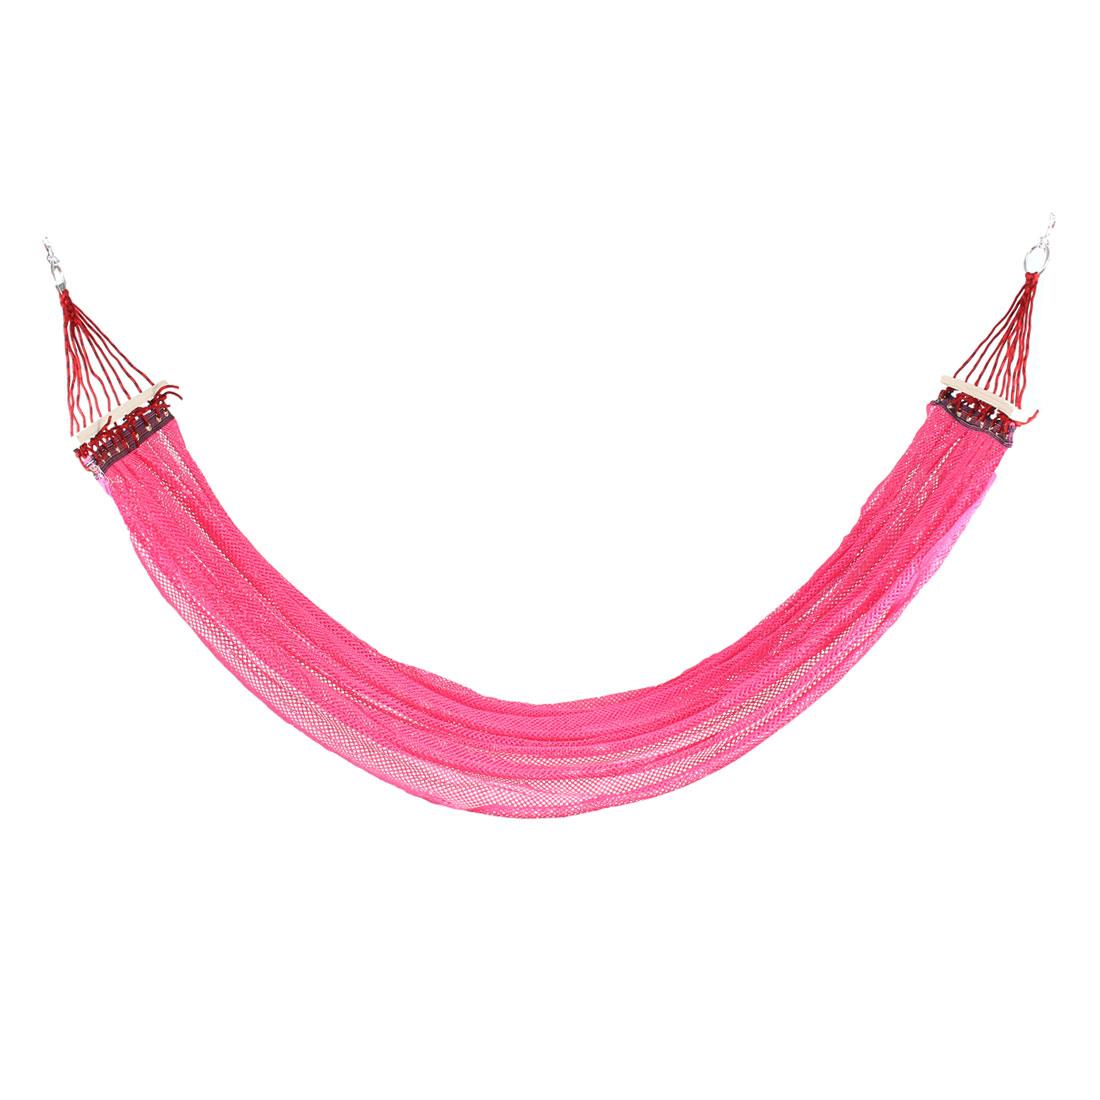 Beach Travel Hiking Nylon Mesh Spreader Swing Hanging Bed Suspended Hammock Pink